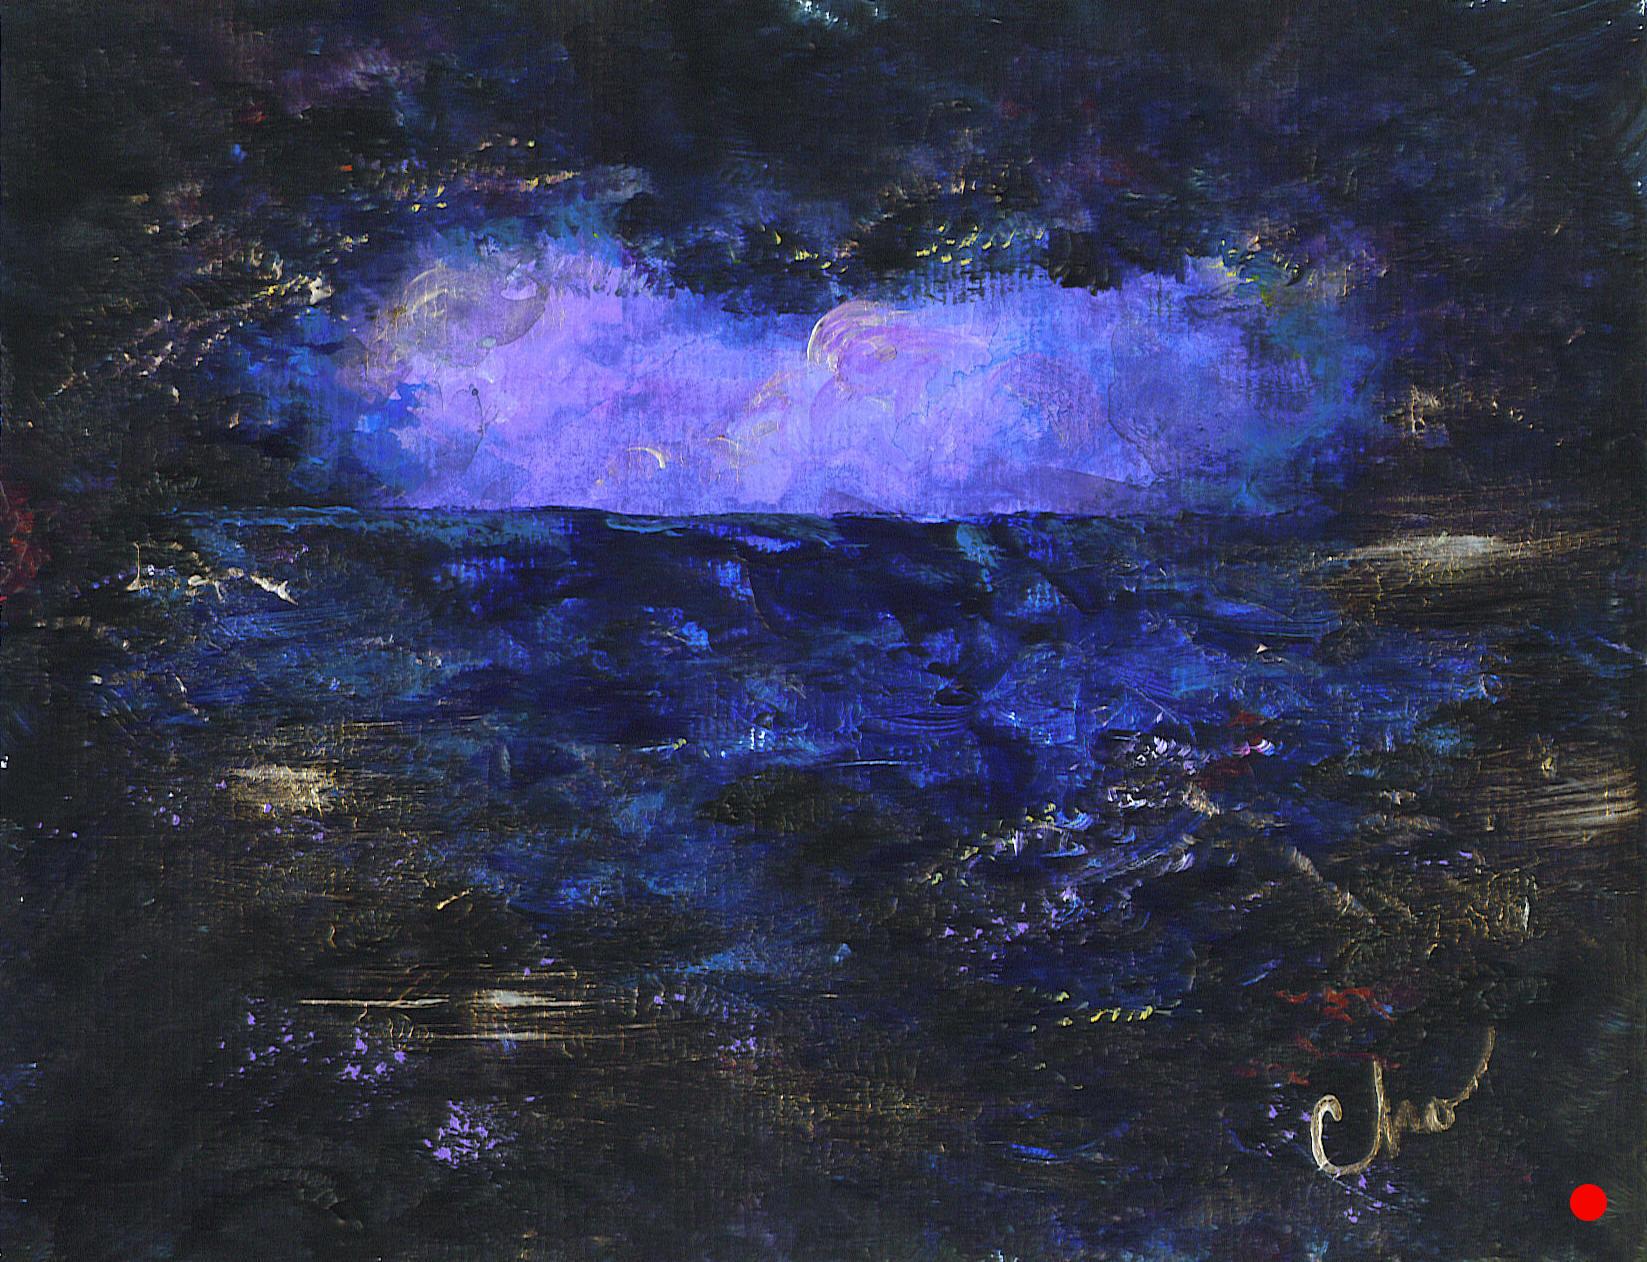 The Indigo Sea (No. 3)